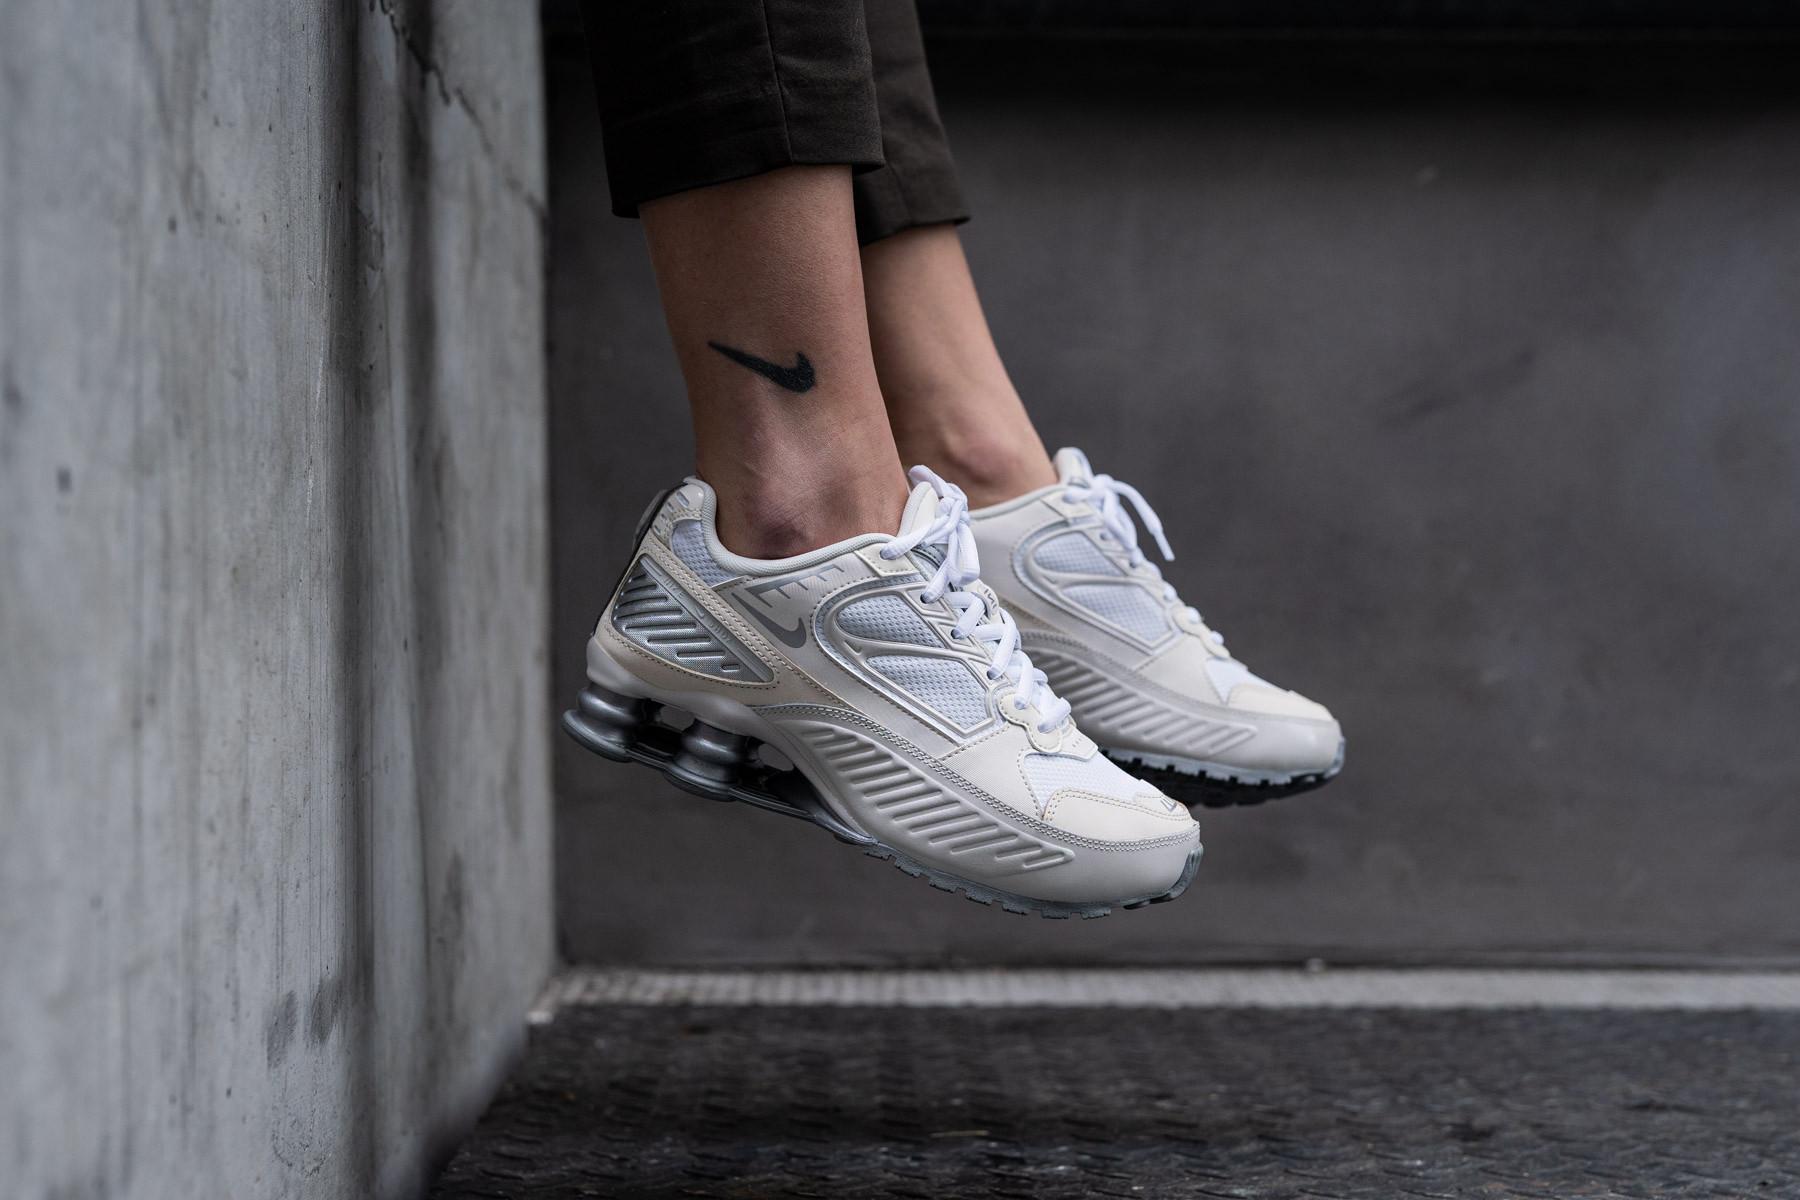 White Nike Shox Shoes.